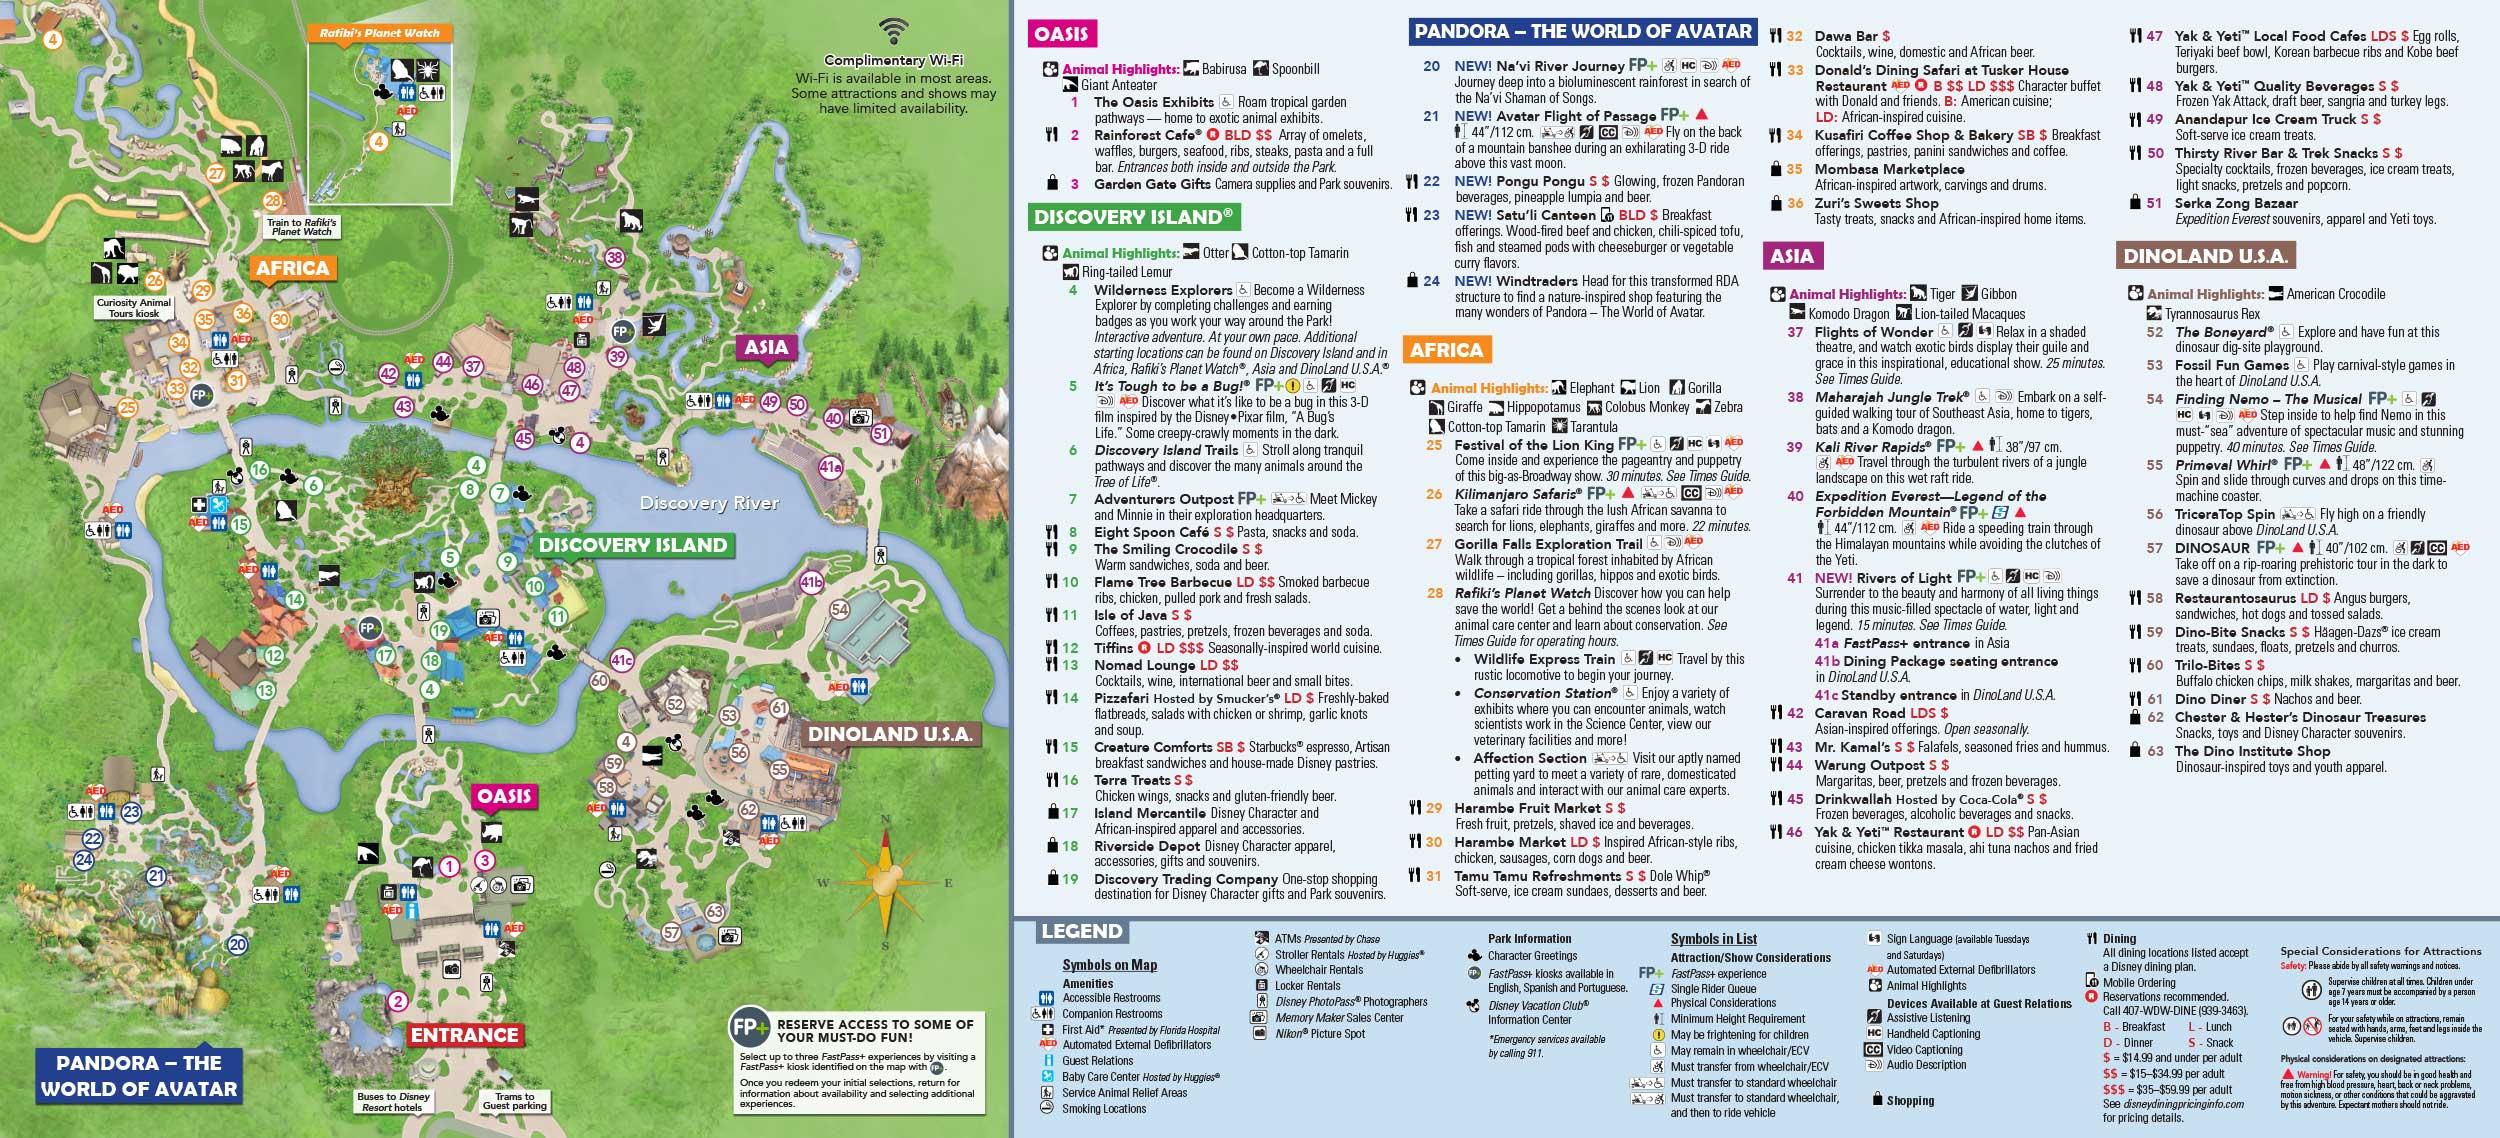 Best Disney World 4-day Family Combos | Universal + Volcano Bay Combo